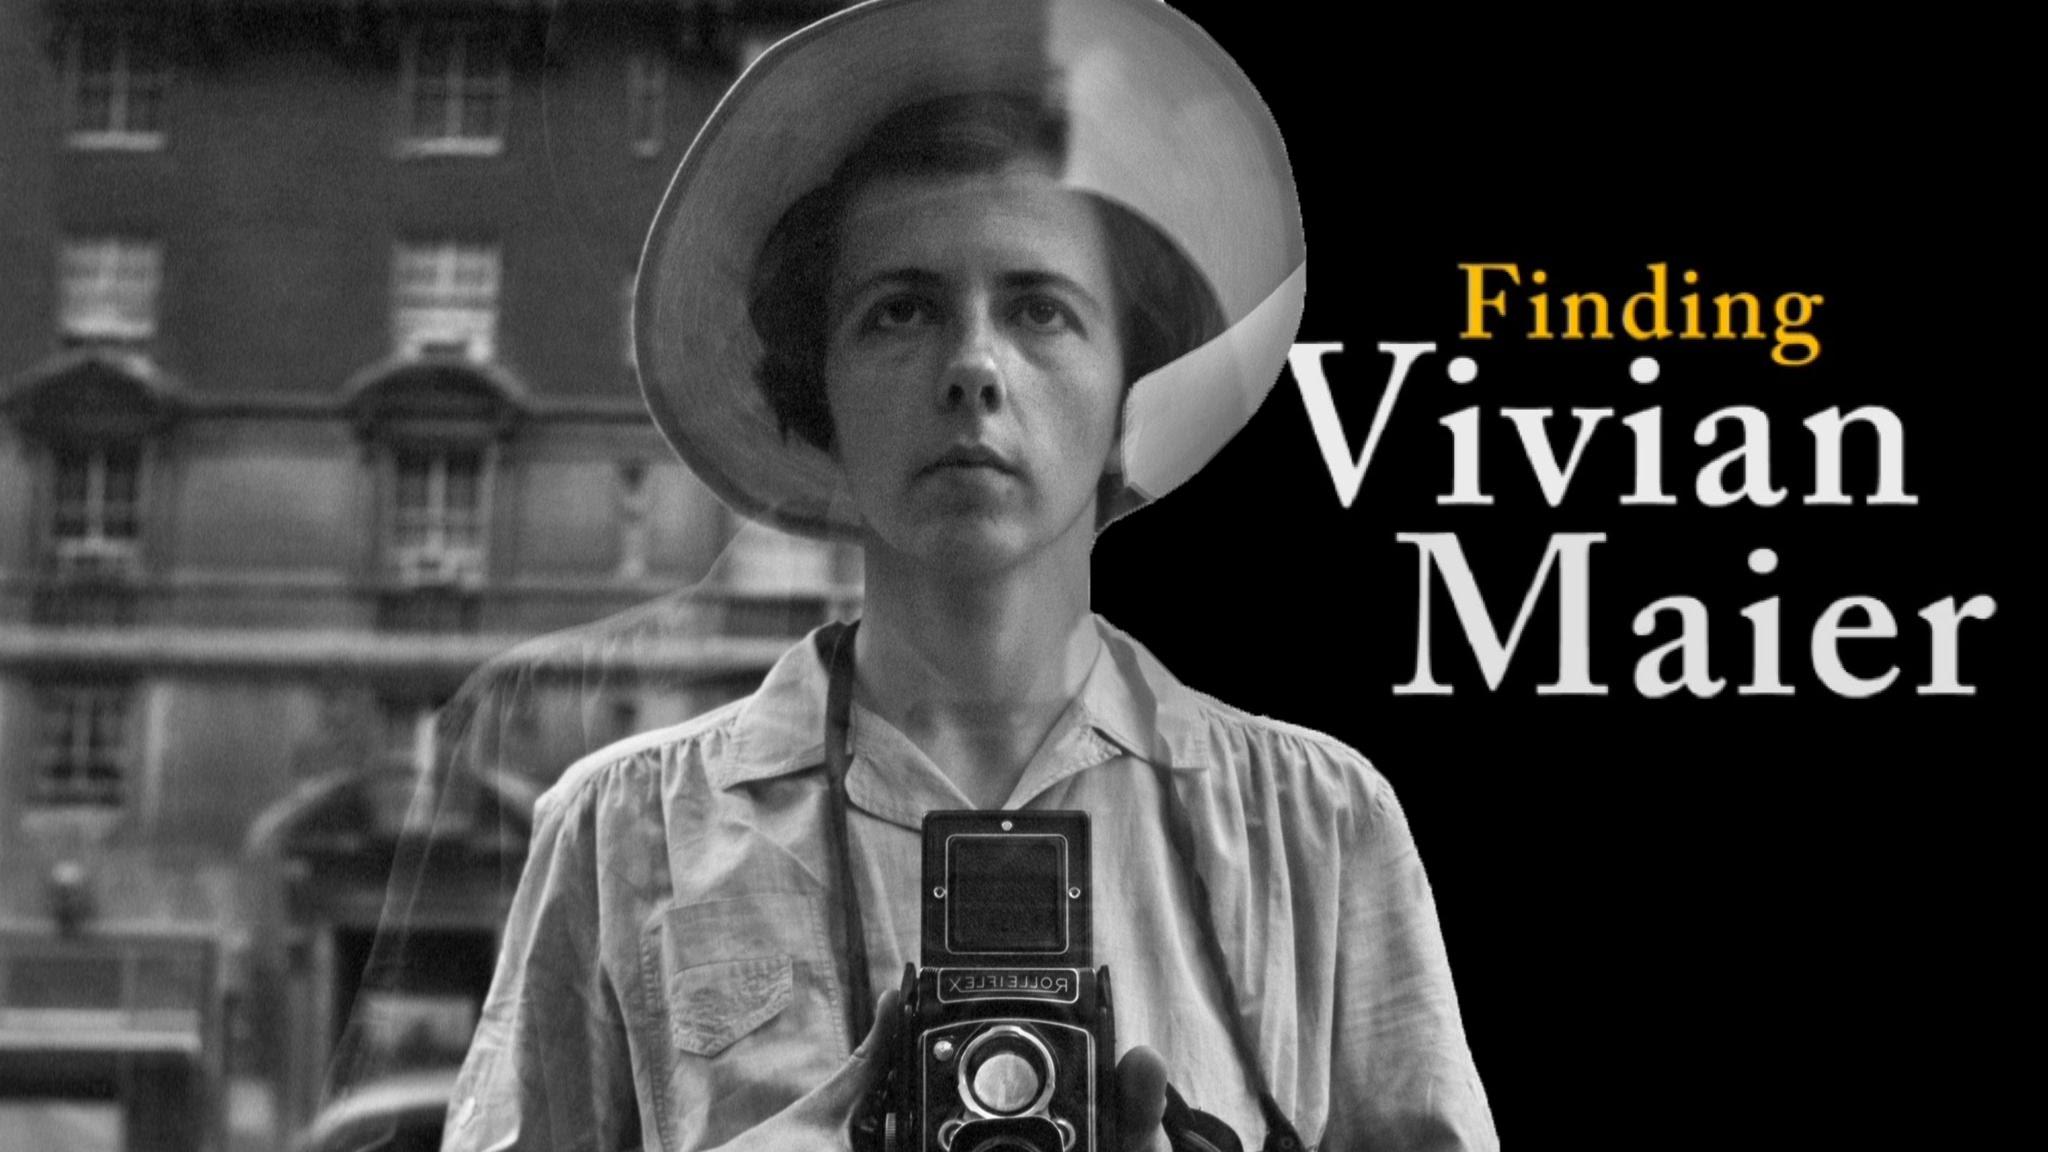 Finding Vivian Maier, Maloof, John and Charlie Siskel, 2013.